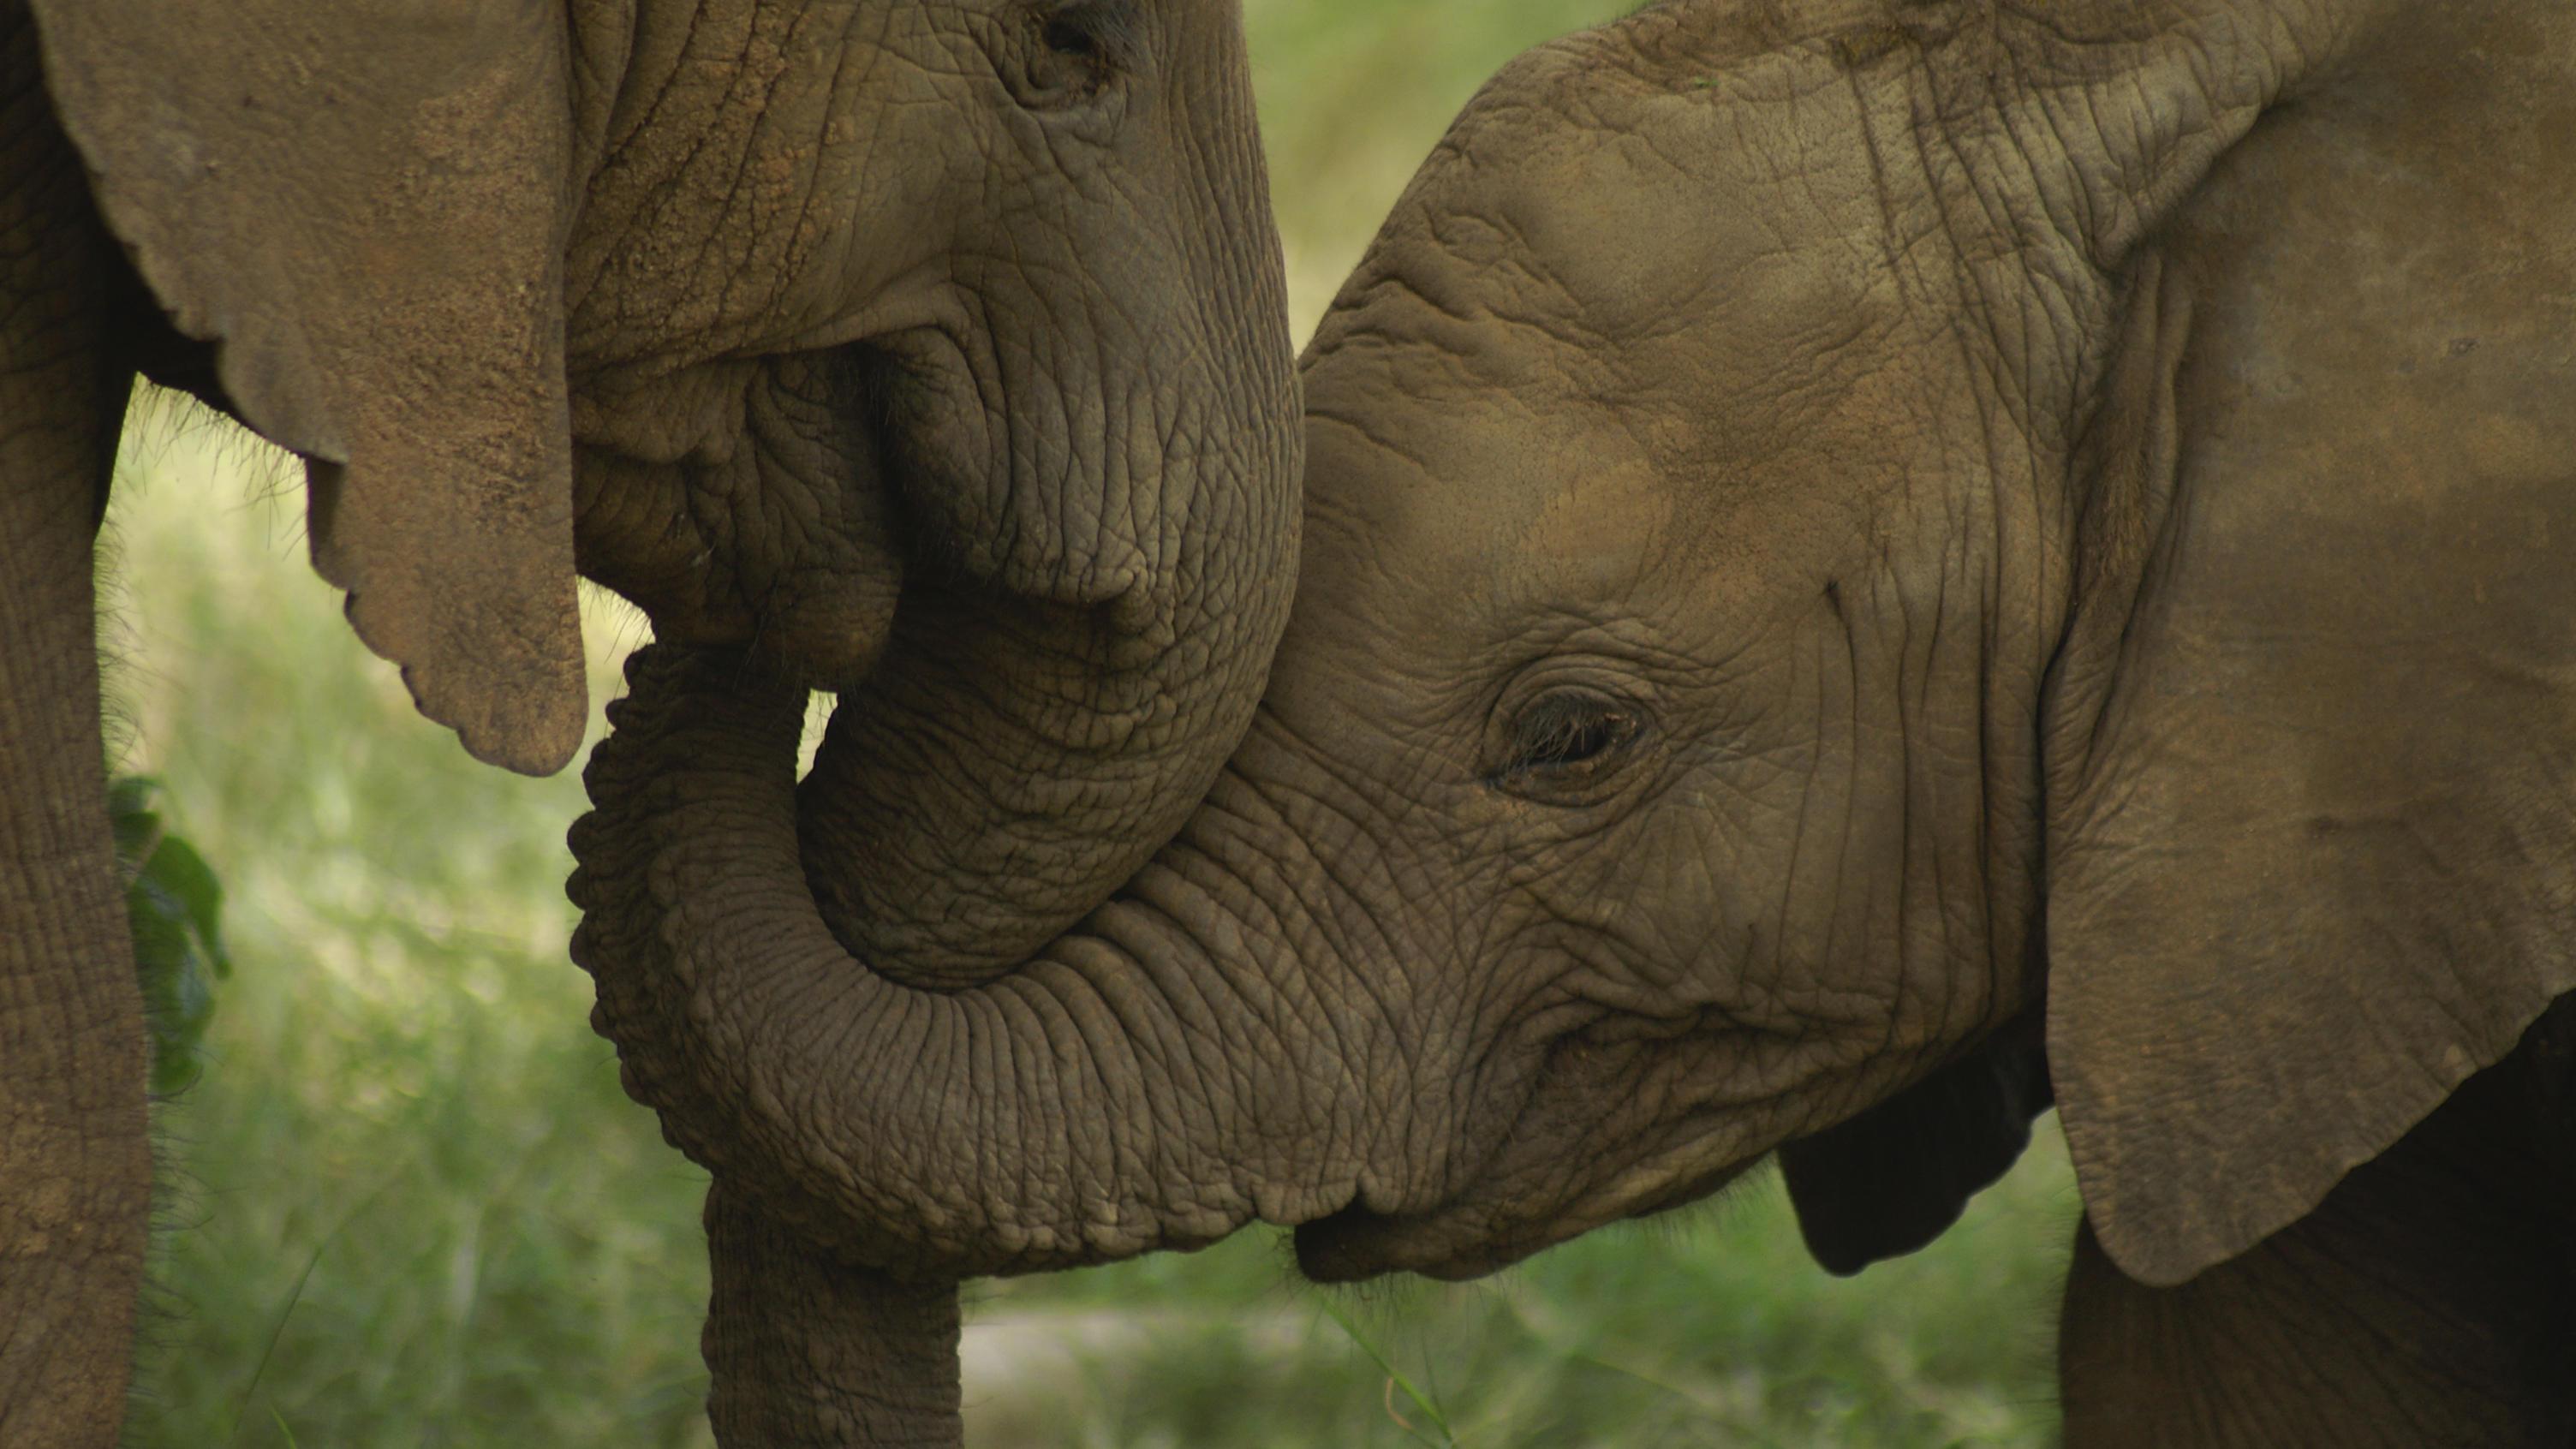 Elefanten Stoßzähne